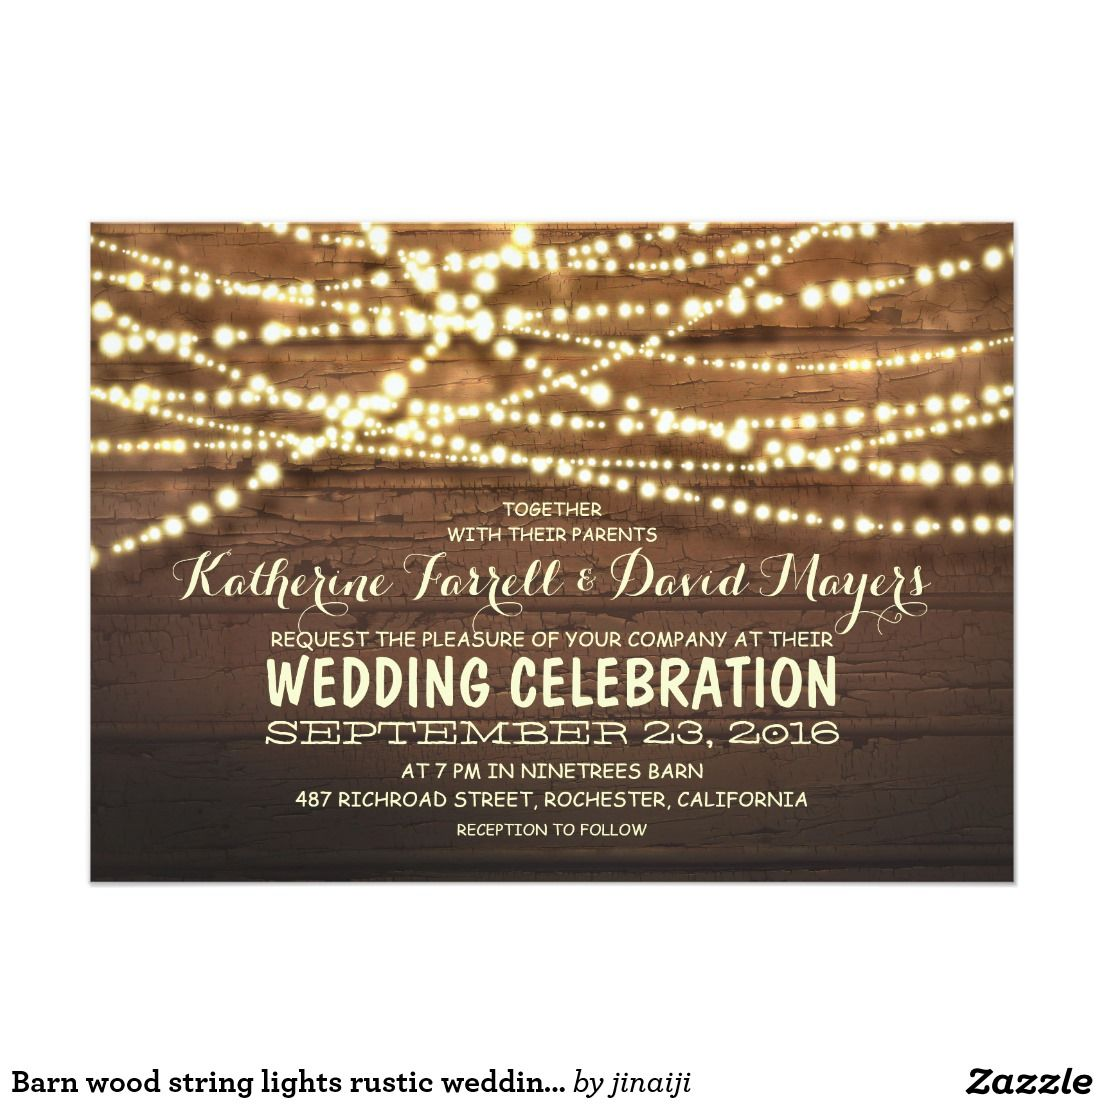 Barn wood string lights rustic wedding invitations.  Artwork designed by Jinaiji. Price $2.16 per card